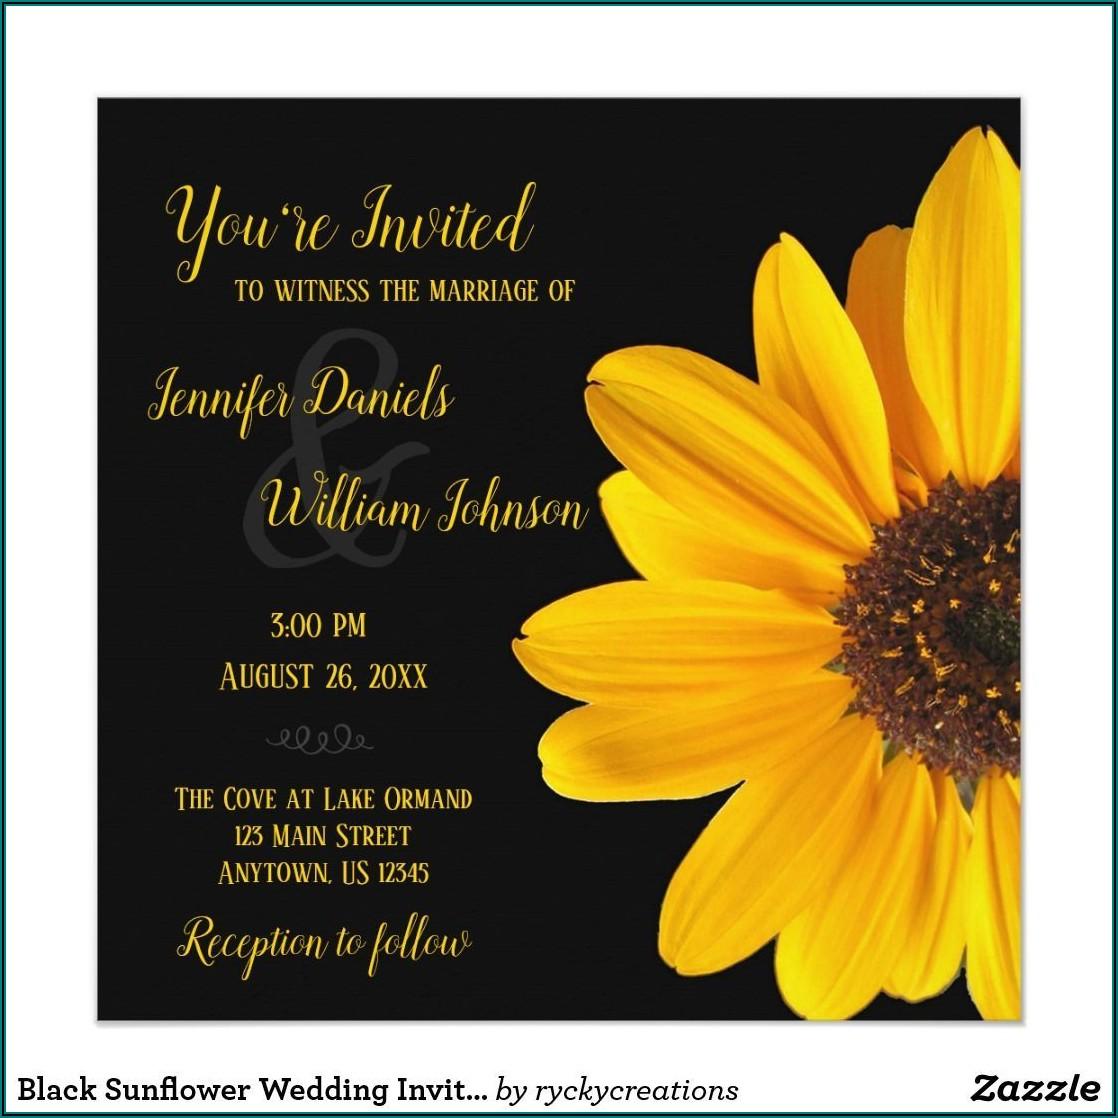 Zazzle Sunflower Wedding Invitations